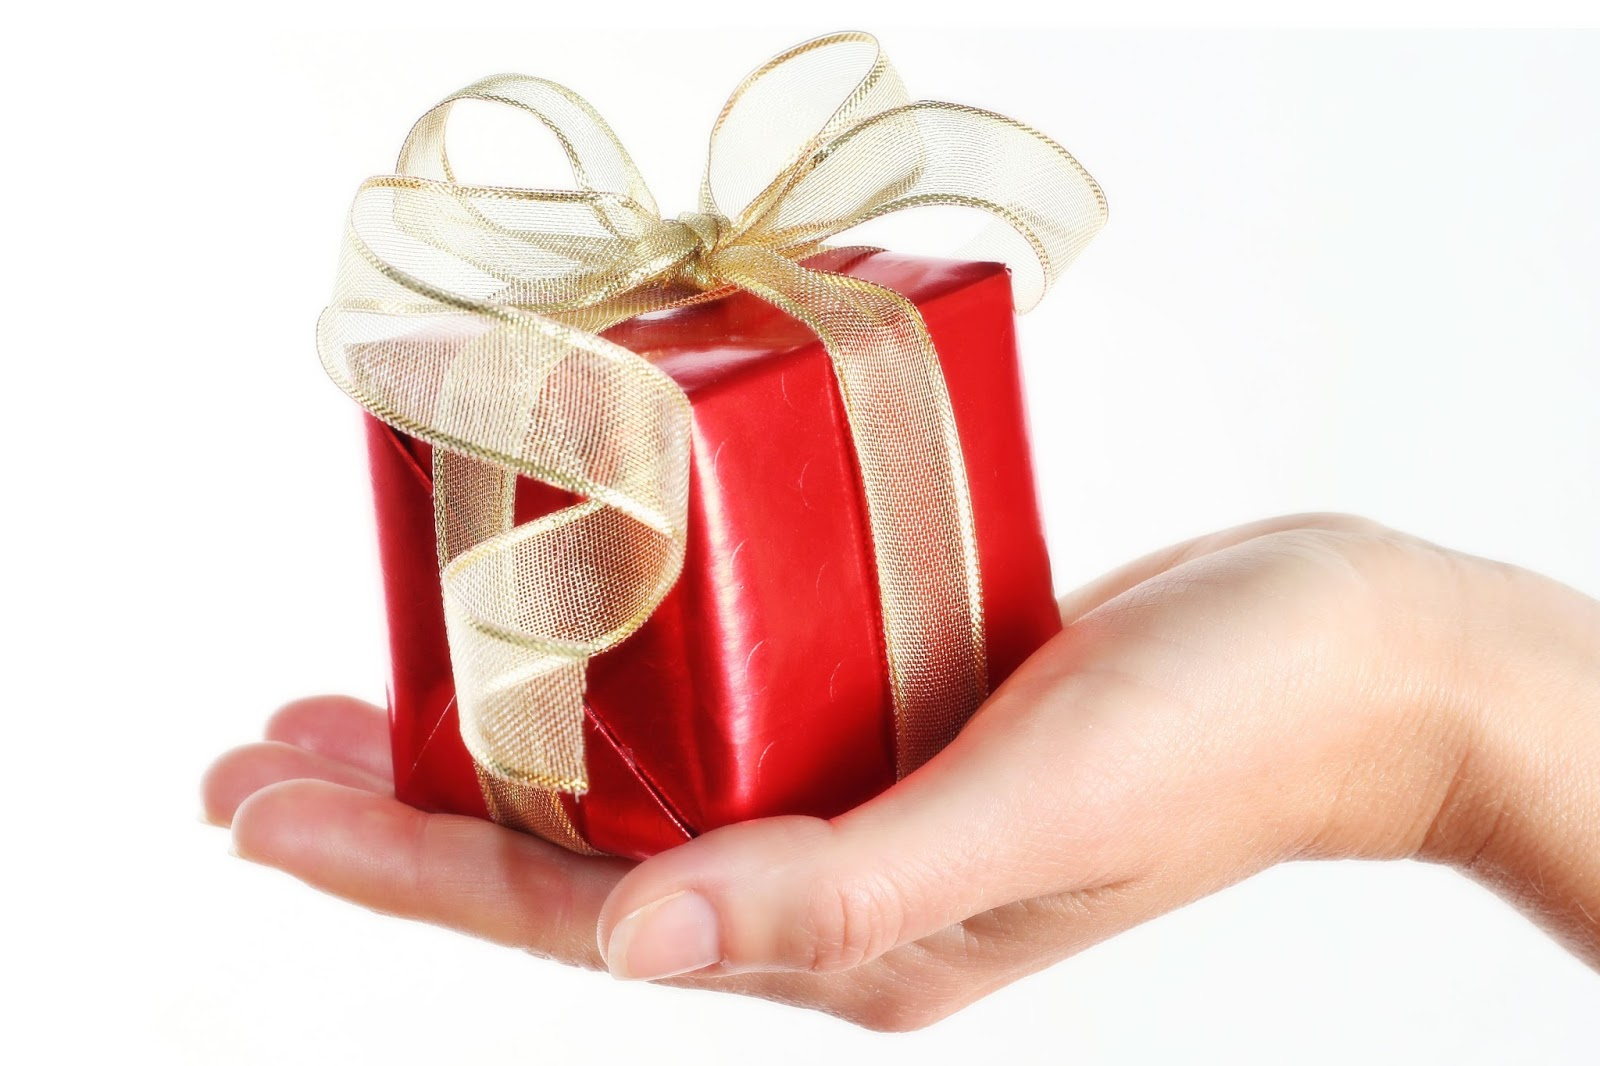 Мы дарим подарки по-английски 97